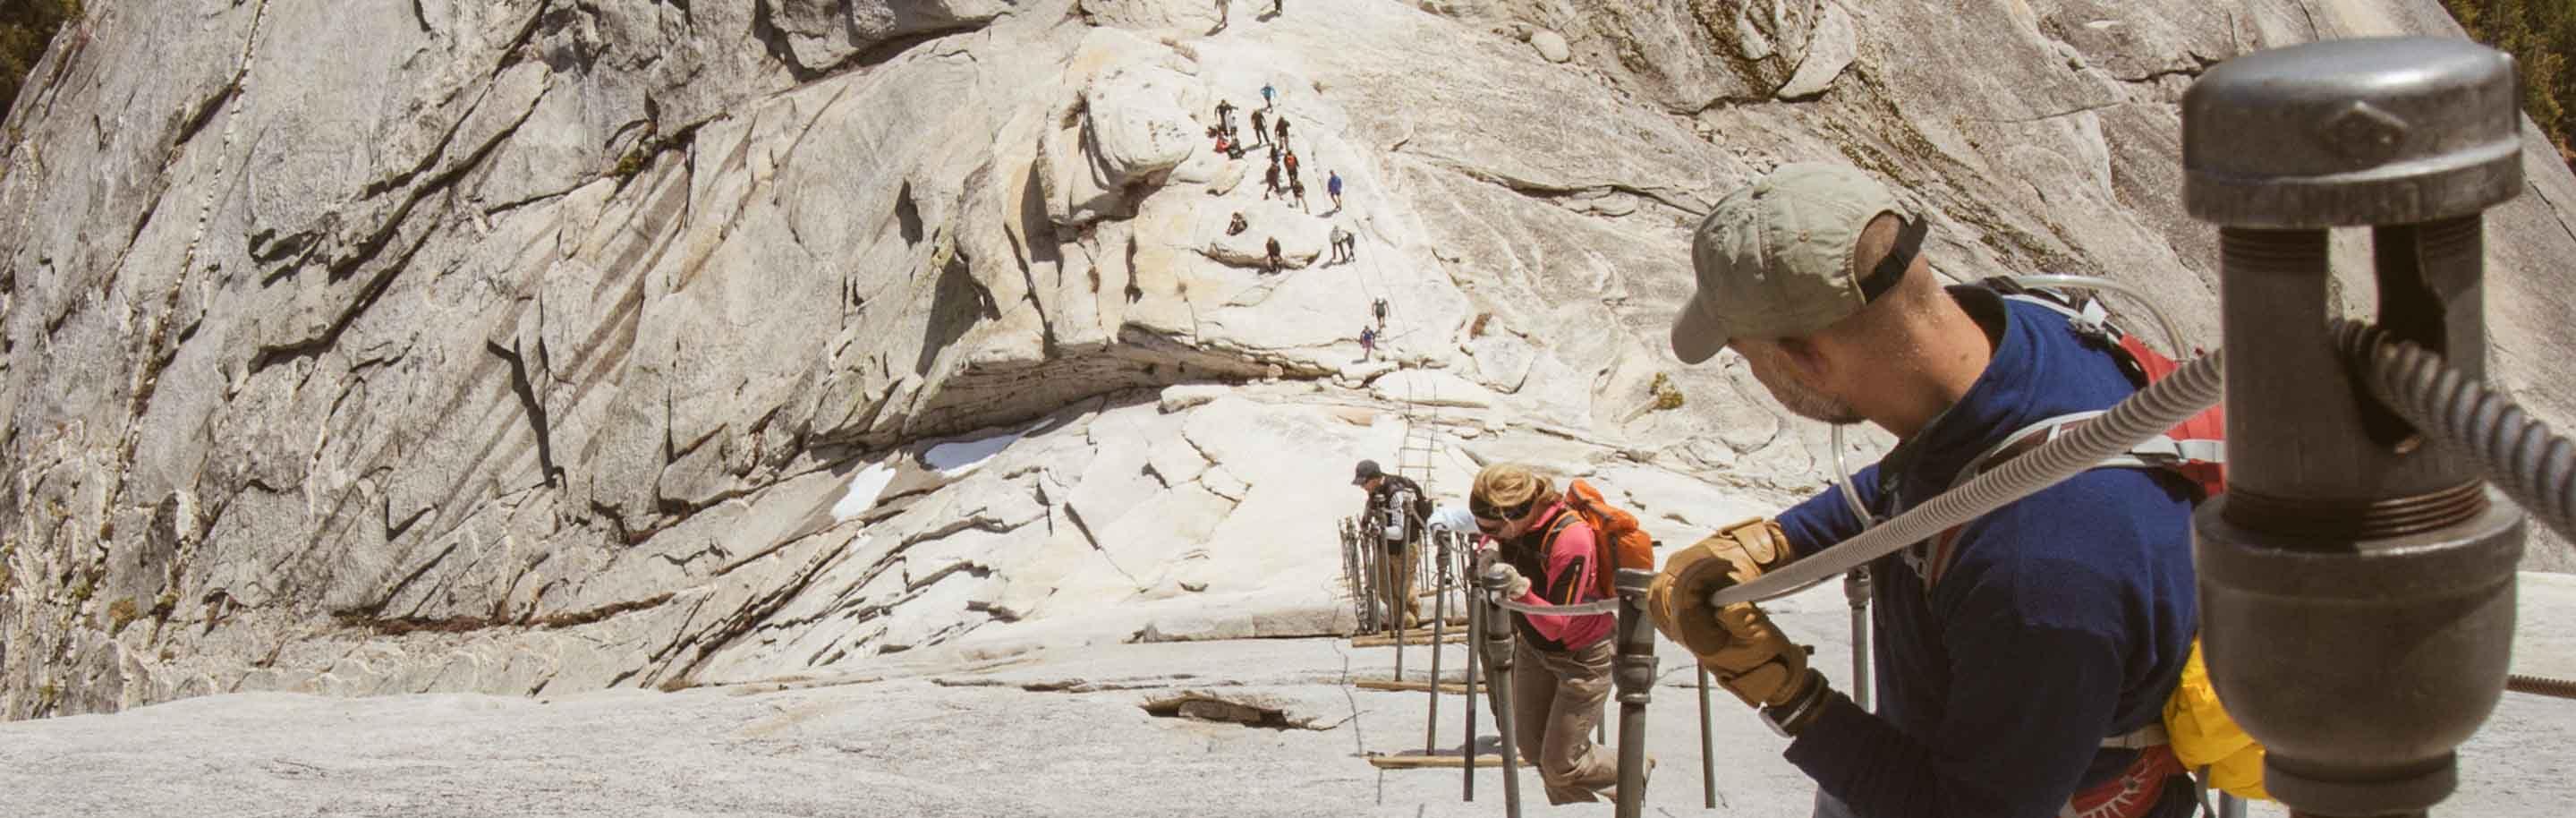 Hikers use cable railing to navigate Yosemite ridge trail.